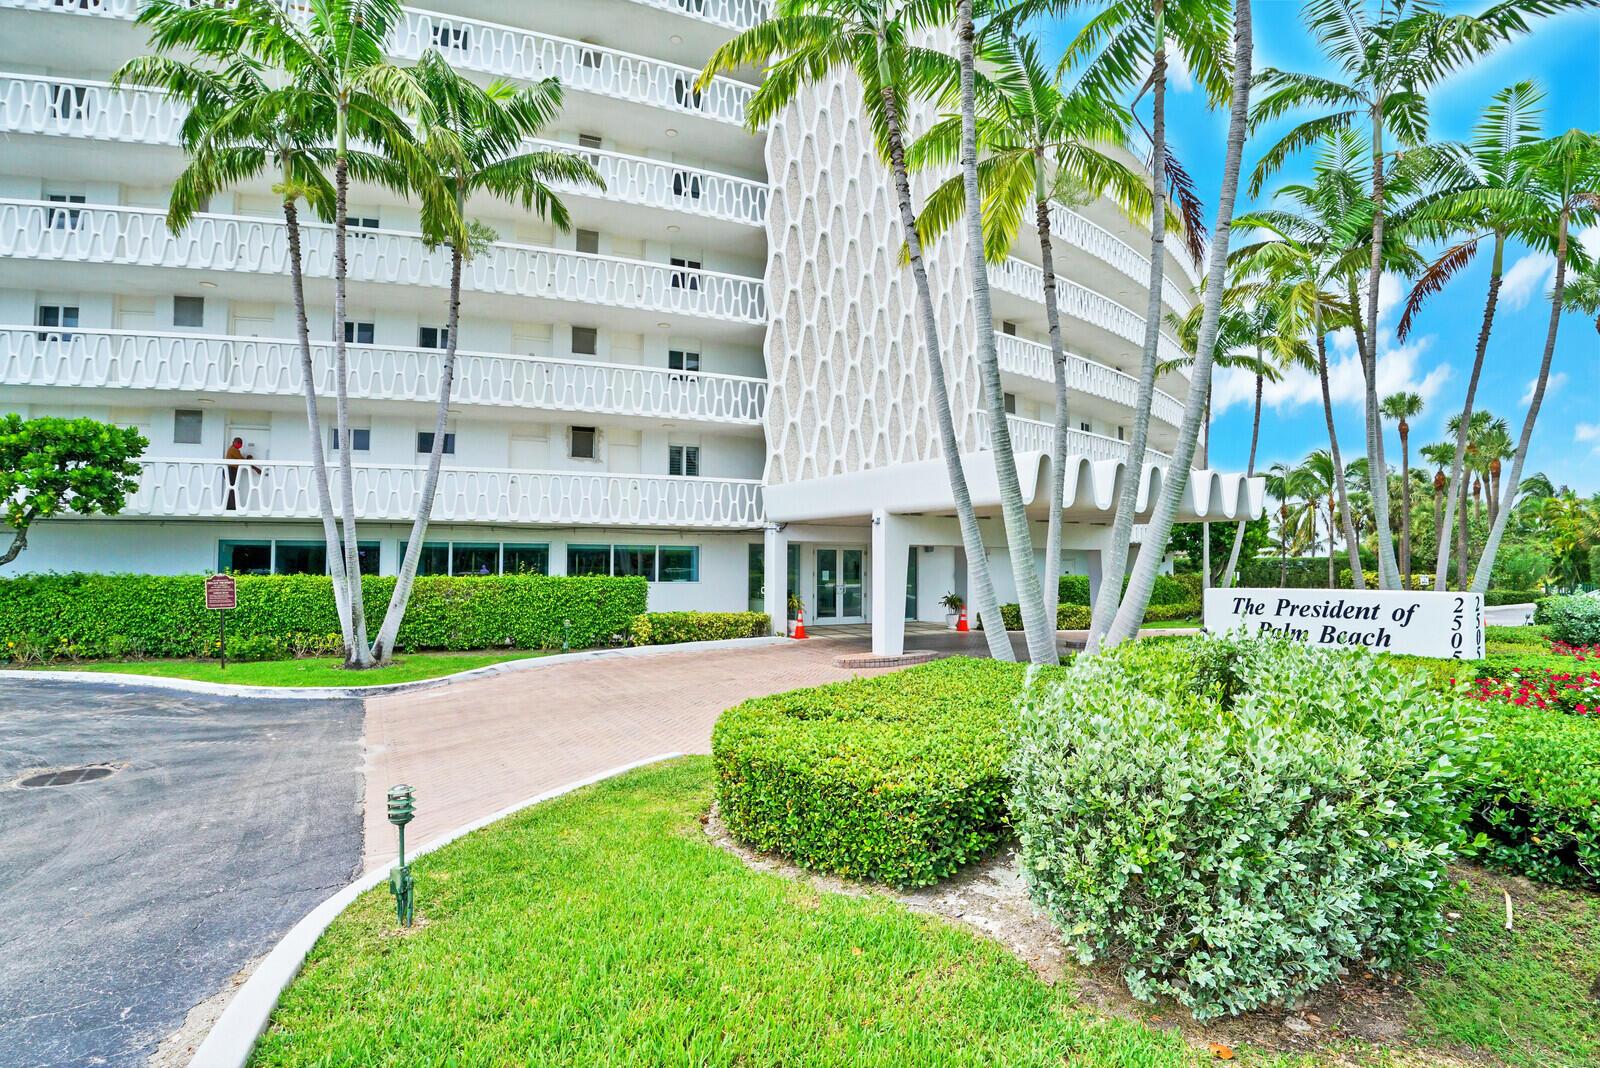 President of Palm Beach_building